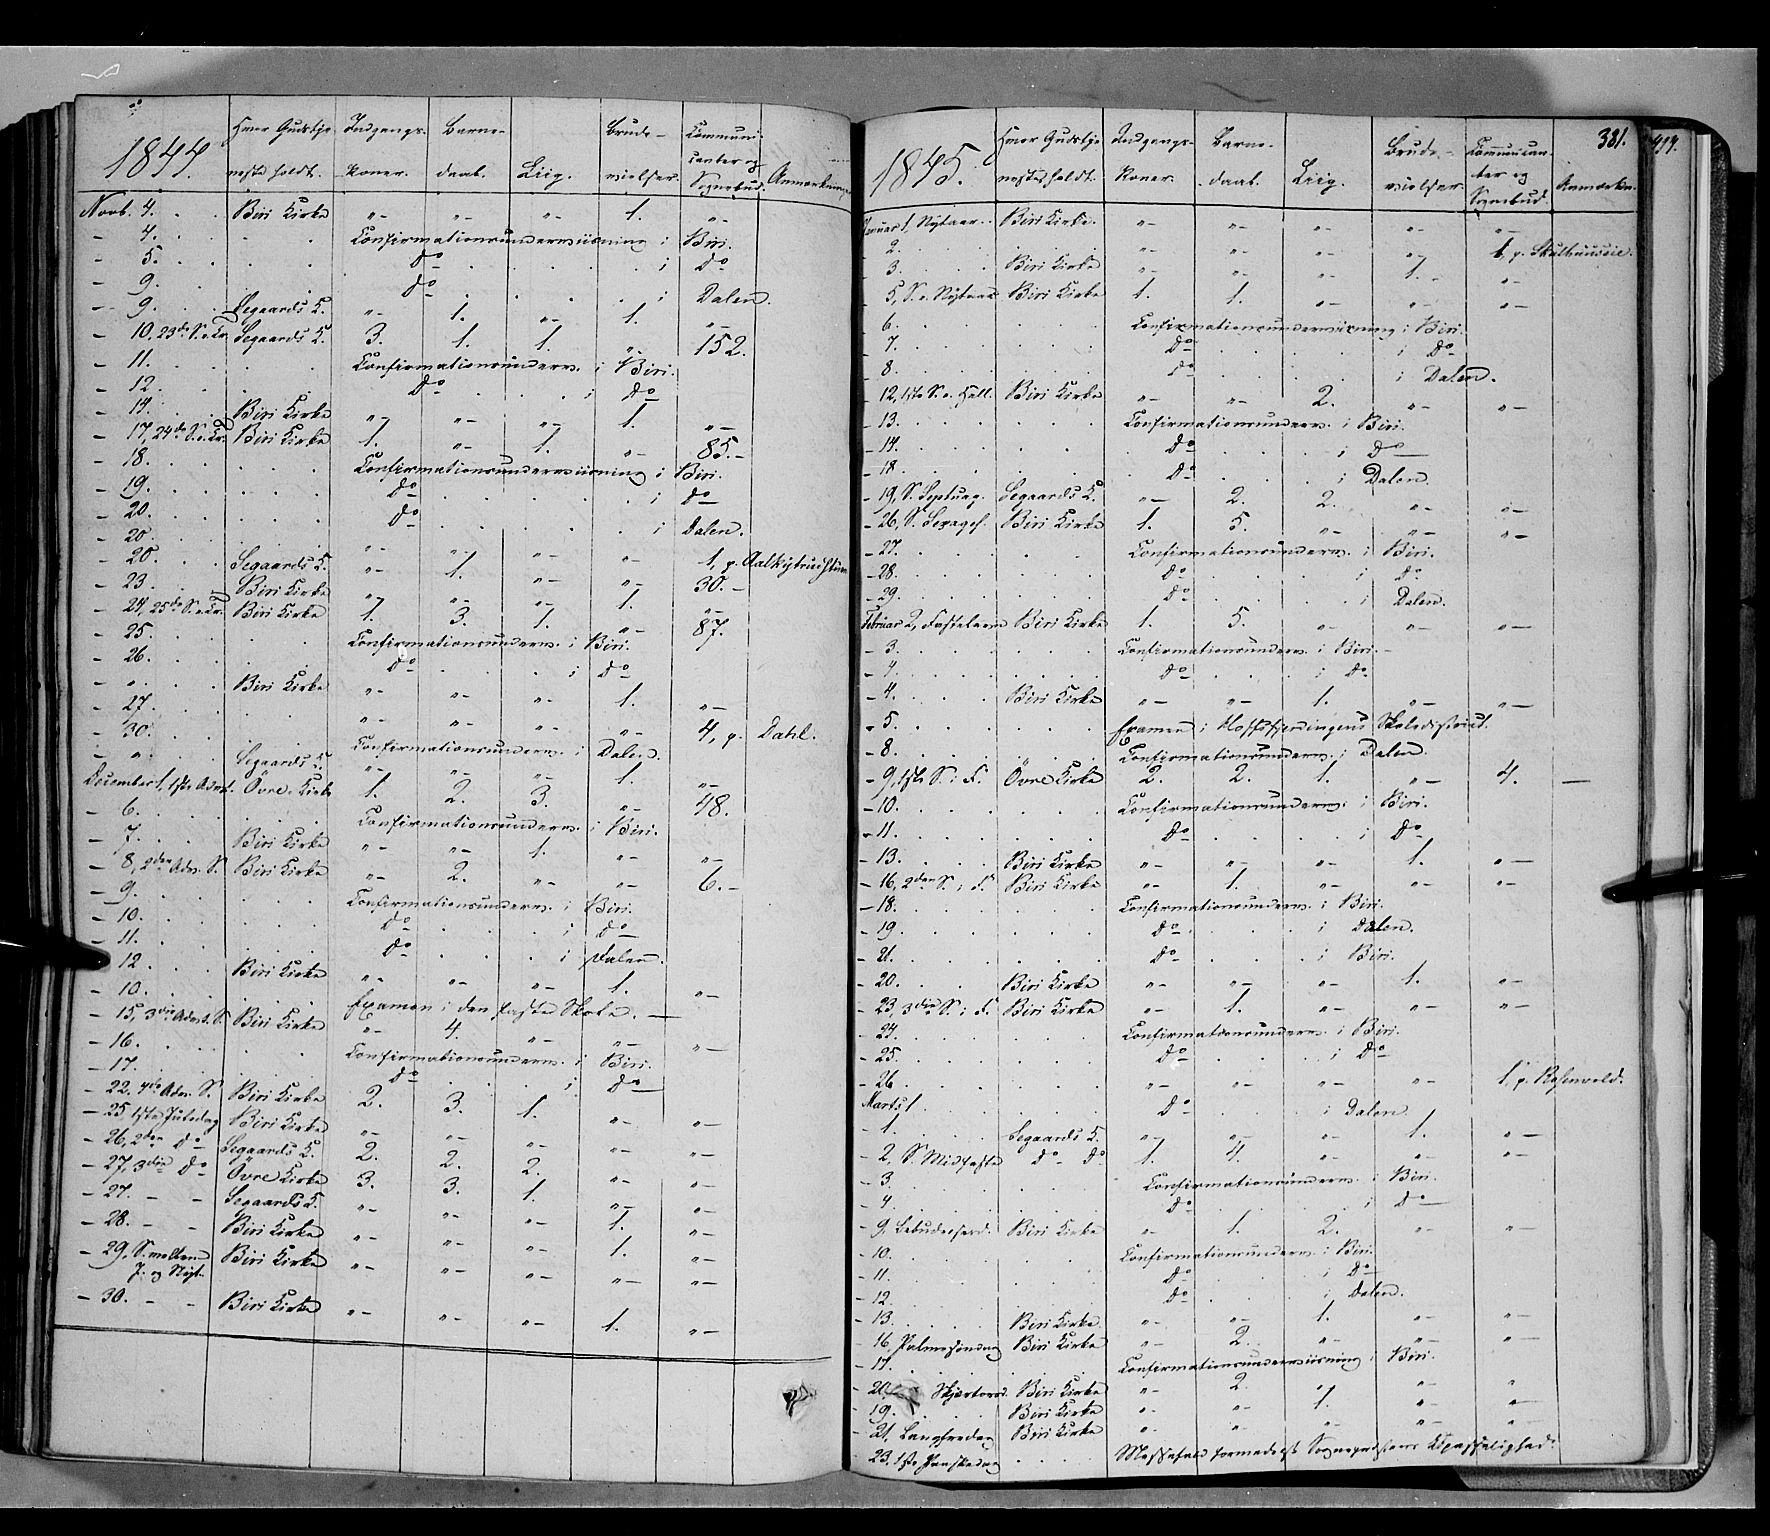 SAH, Biri prestekontor, Ministerialbok nr. 5, 1843-1854, s. 381